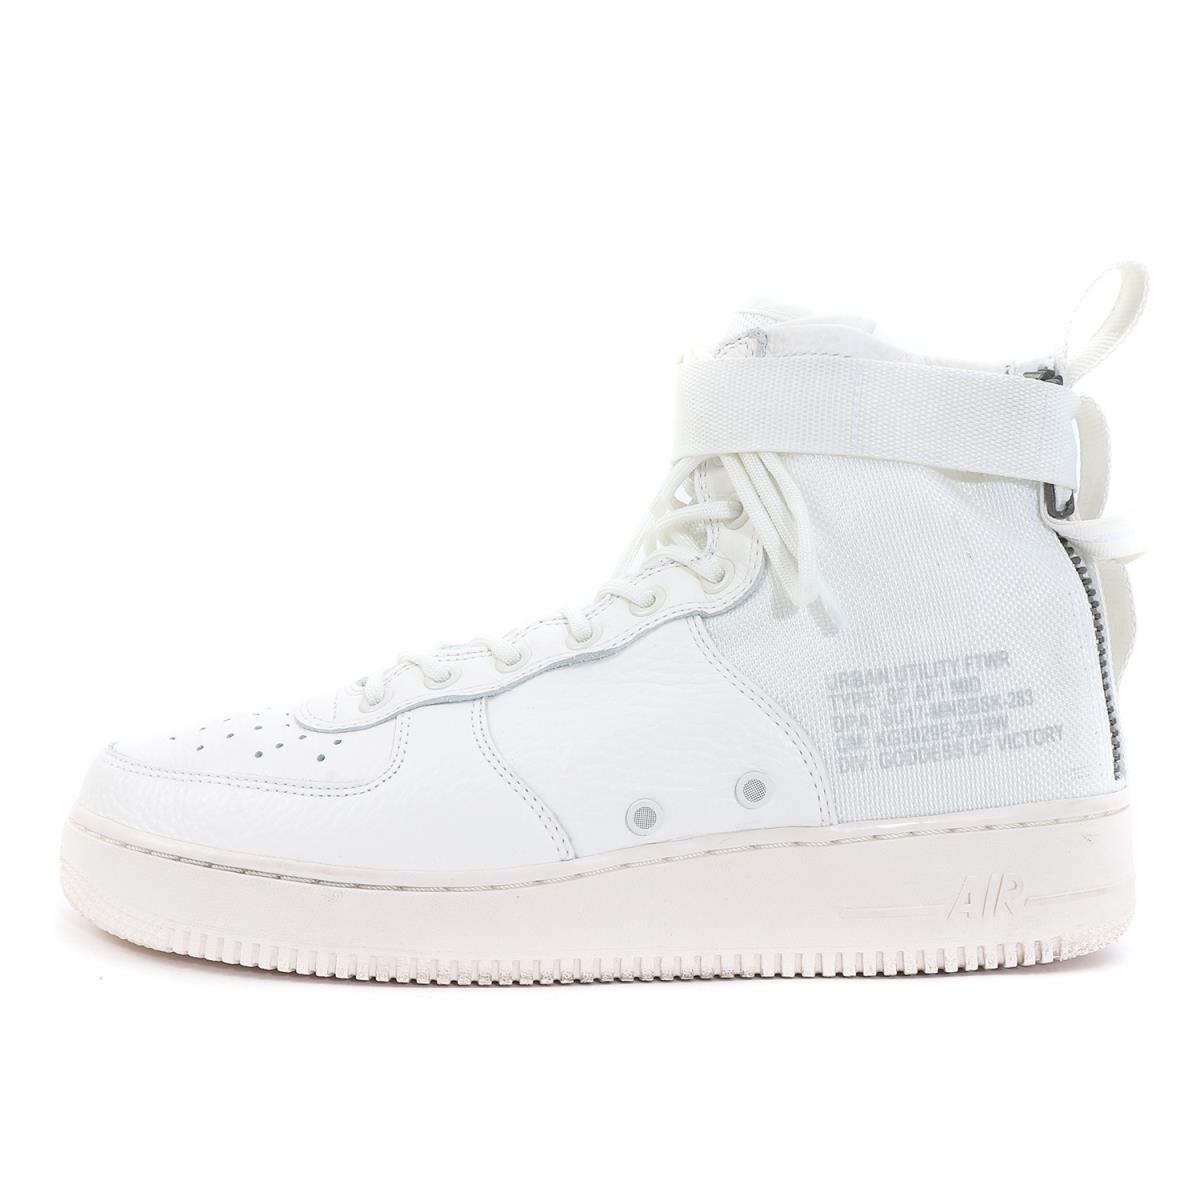 brand new 9bb43 d86f8 NIKE (Nike) SF AF1 MID (AA6655-100) ivory US10(28cm)